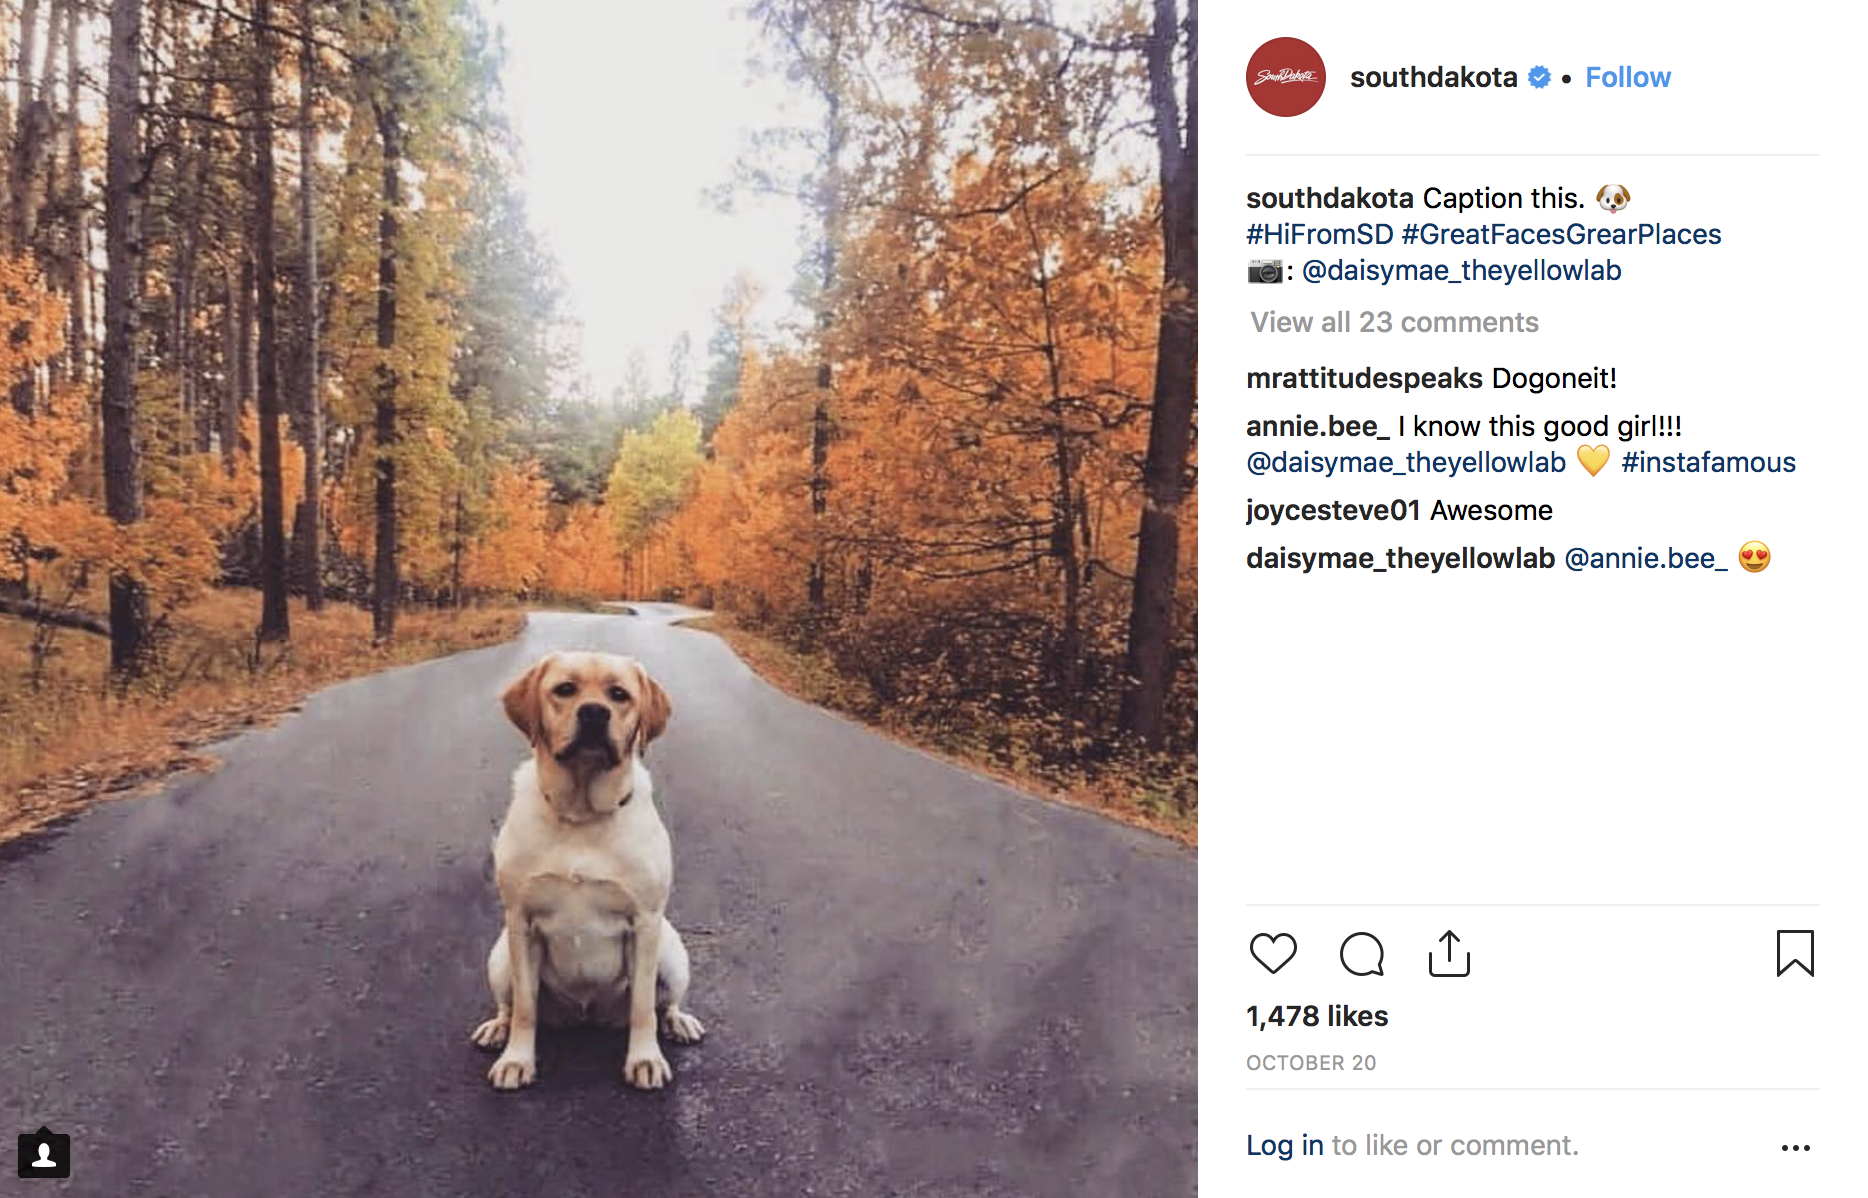 South Dakota instagram engagement